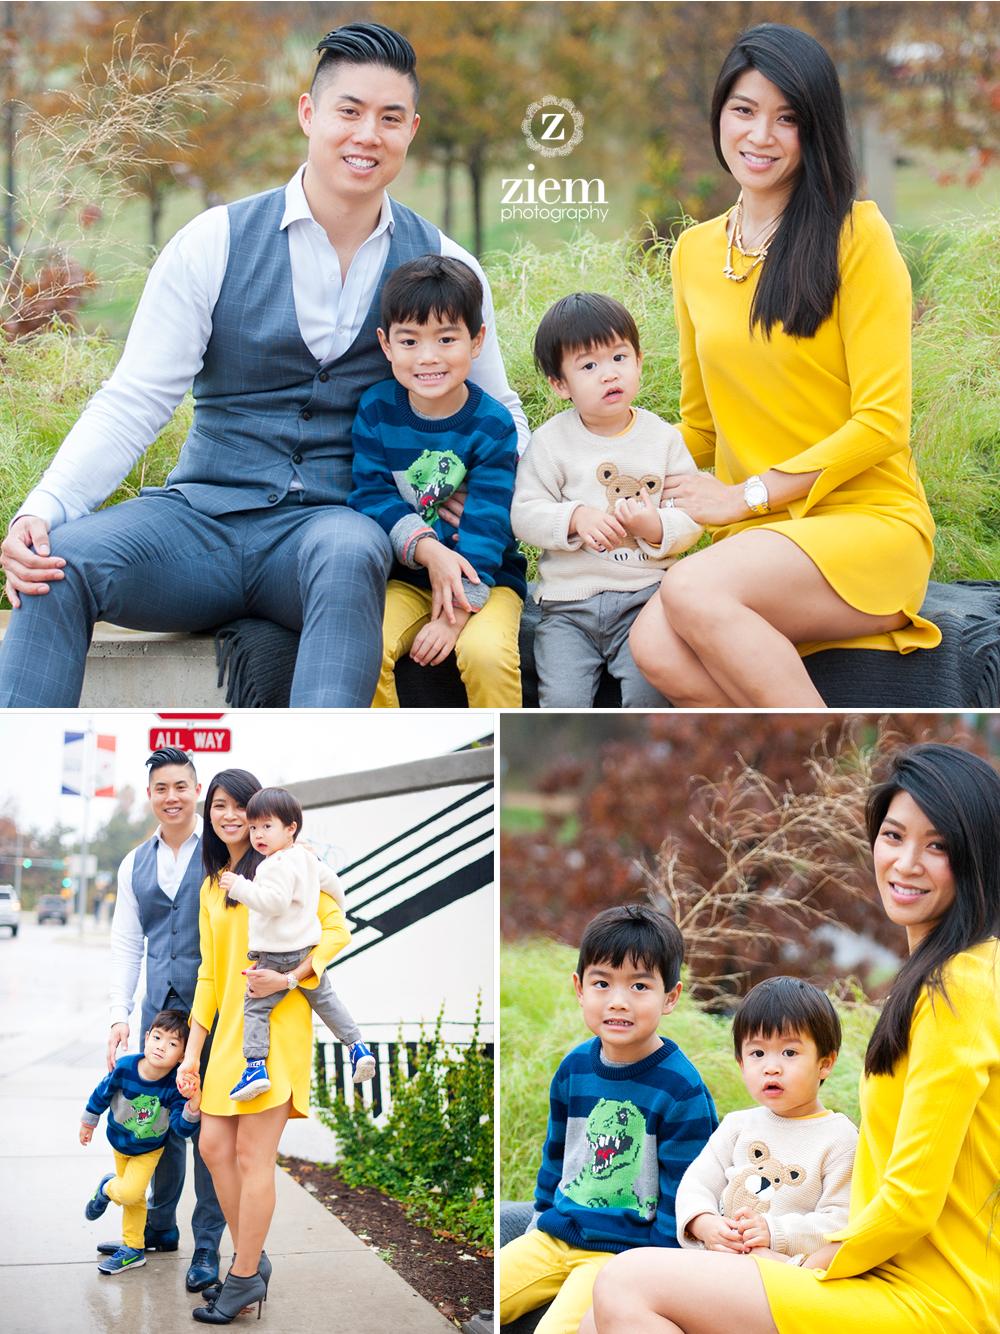 Austin Family Portrait Photographers Cho Ziem Lifestyle Newborn Ziem Photography